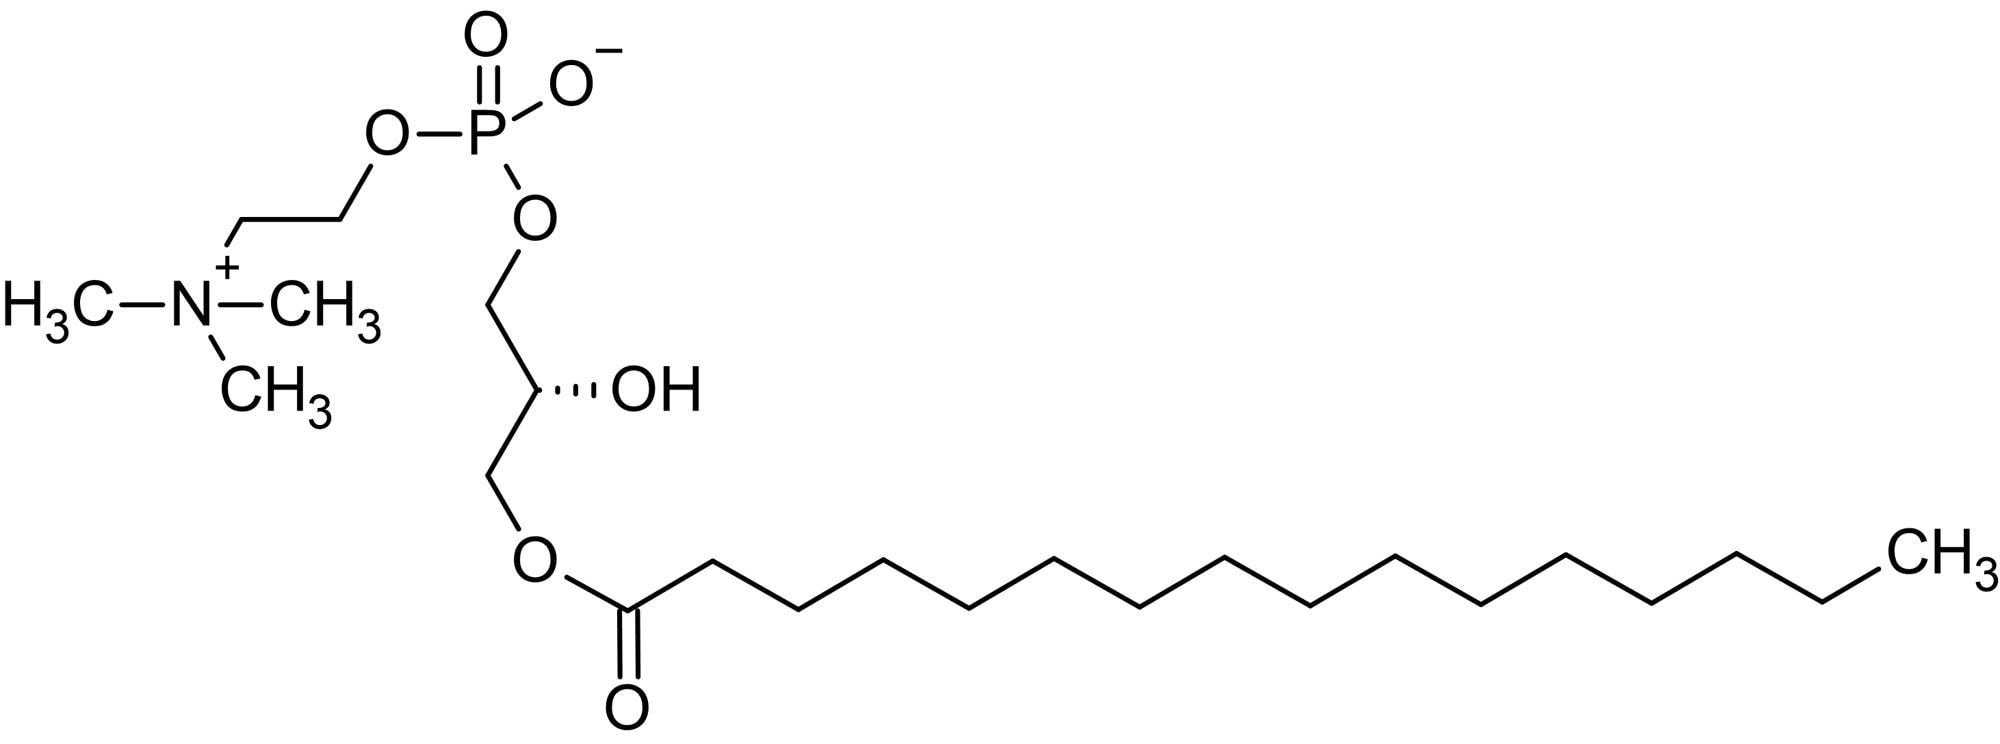 Chemical Structure - 1-Palmitoyl-<em>sn</em>-glycero-3-phosphorylcholine (ab143963)